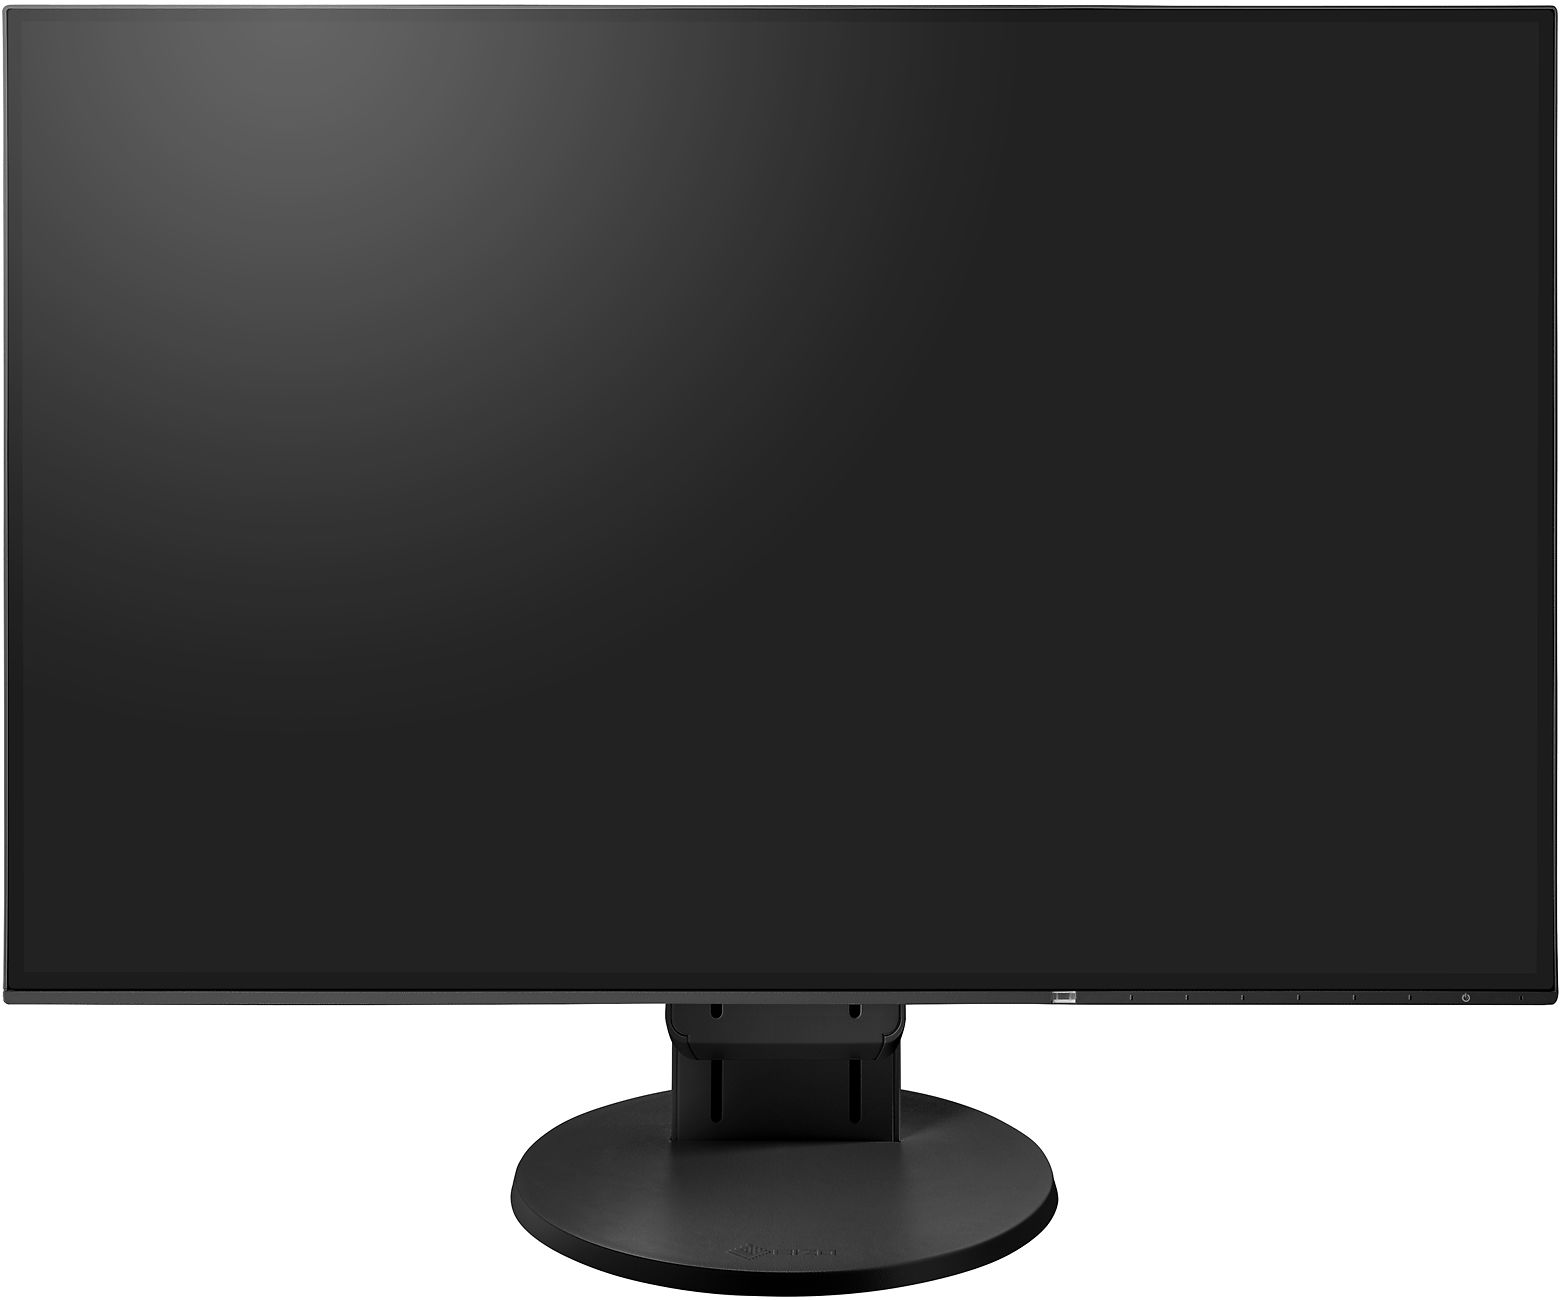 "Eizo Flexscan EV2456 24"" Monitor Image"